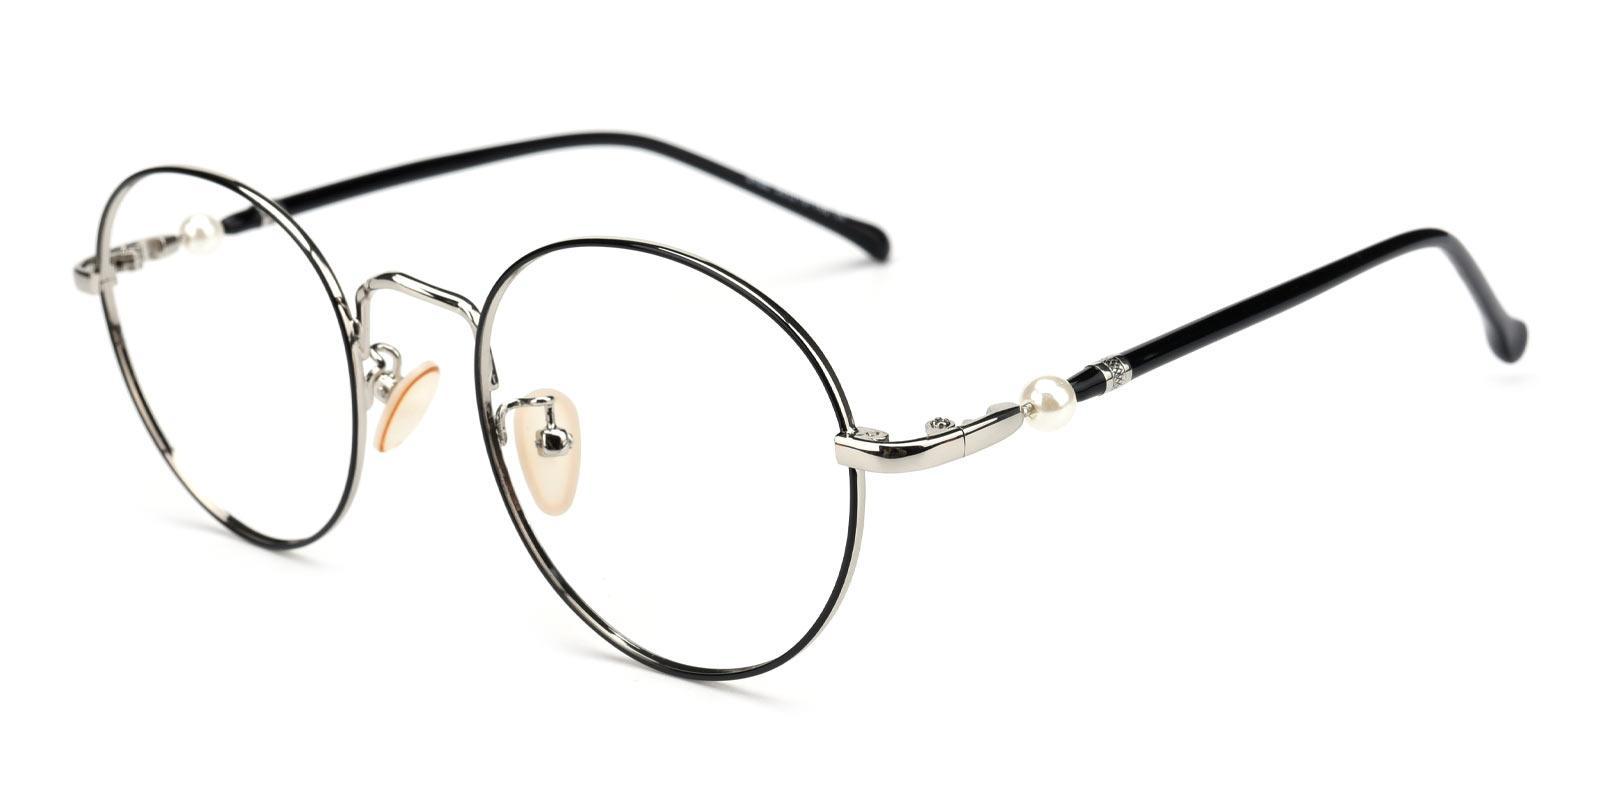 Oswego-Silver-Round-Metal-Eyeglasses-additional1